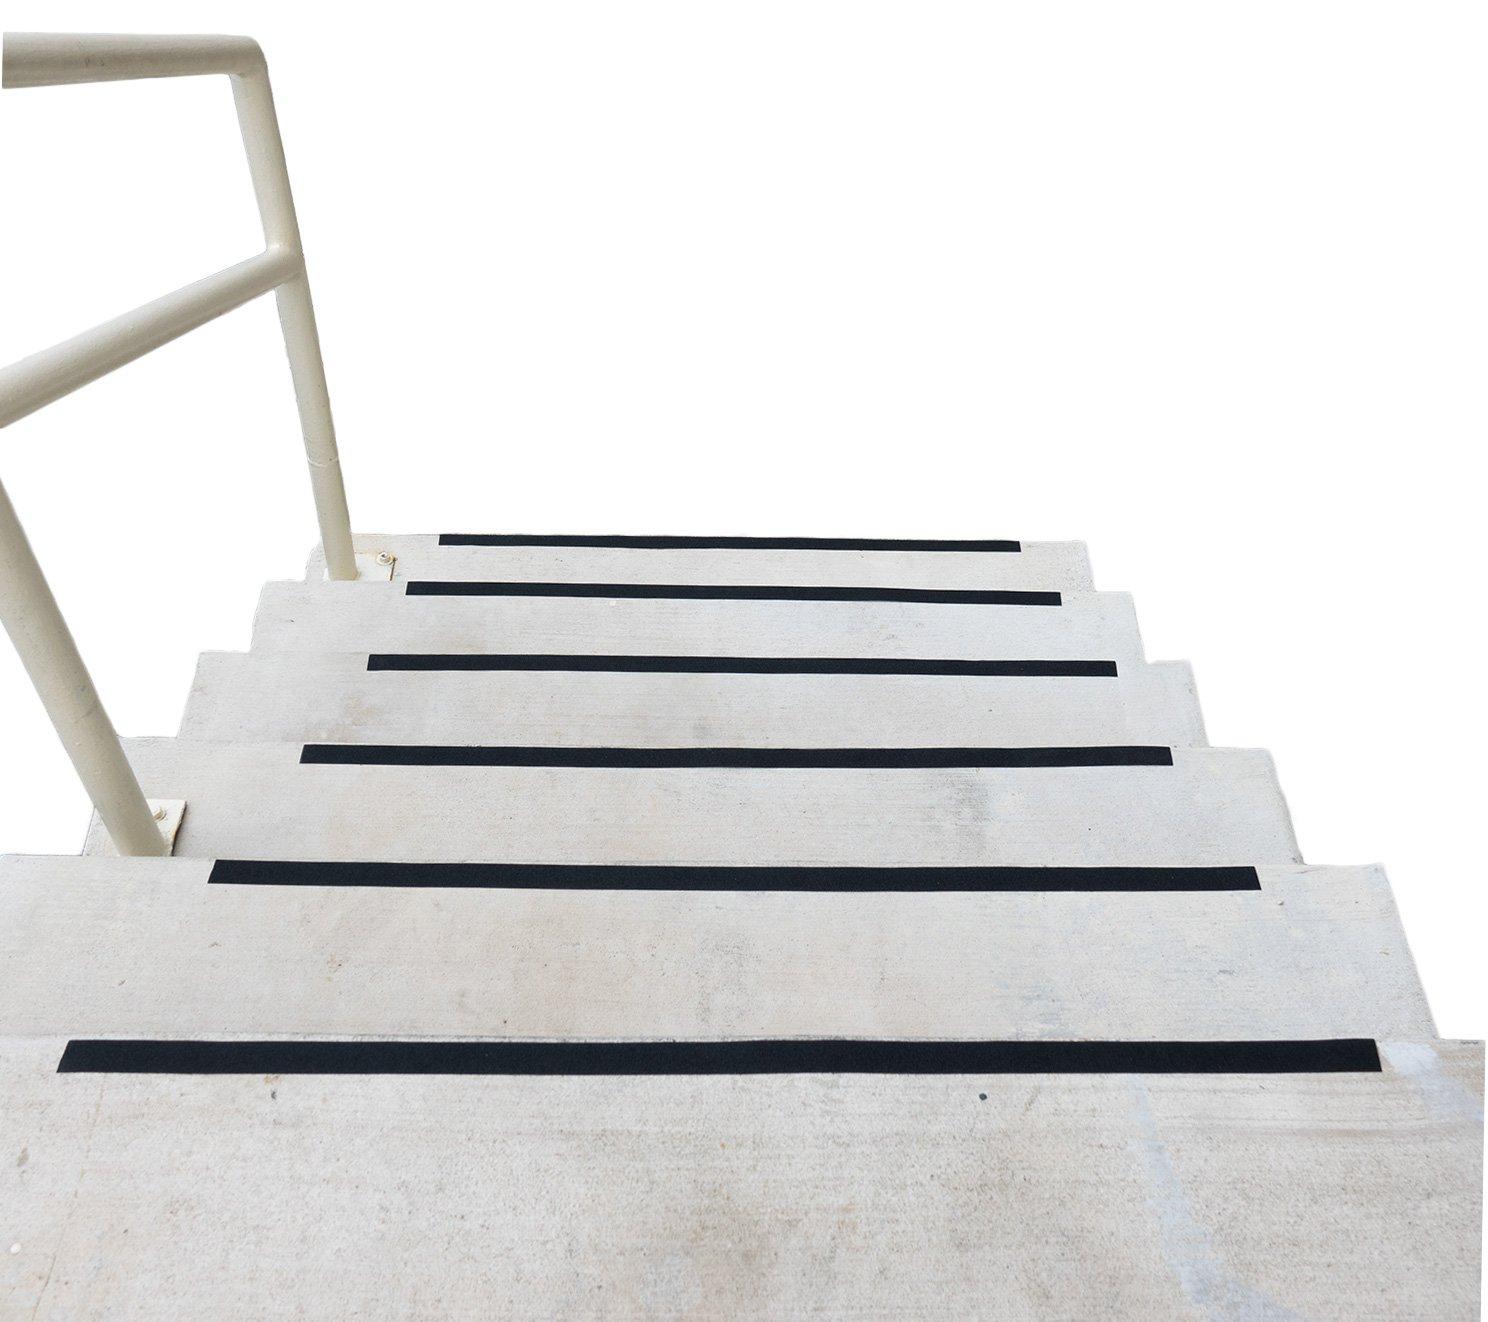 Black Anti Slip Safety Grit Non Slip Tape - Highest Traction 60' Feet Many Sizes (1 inch width)